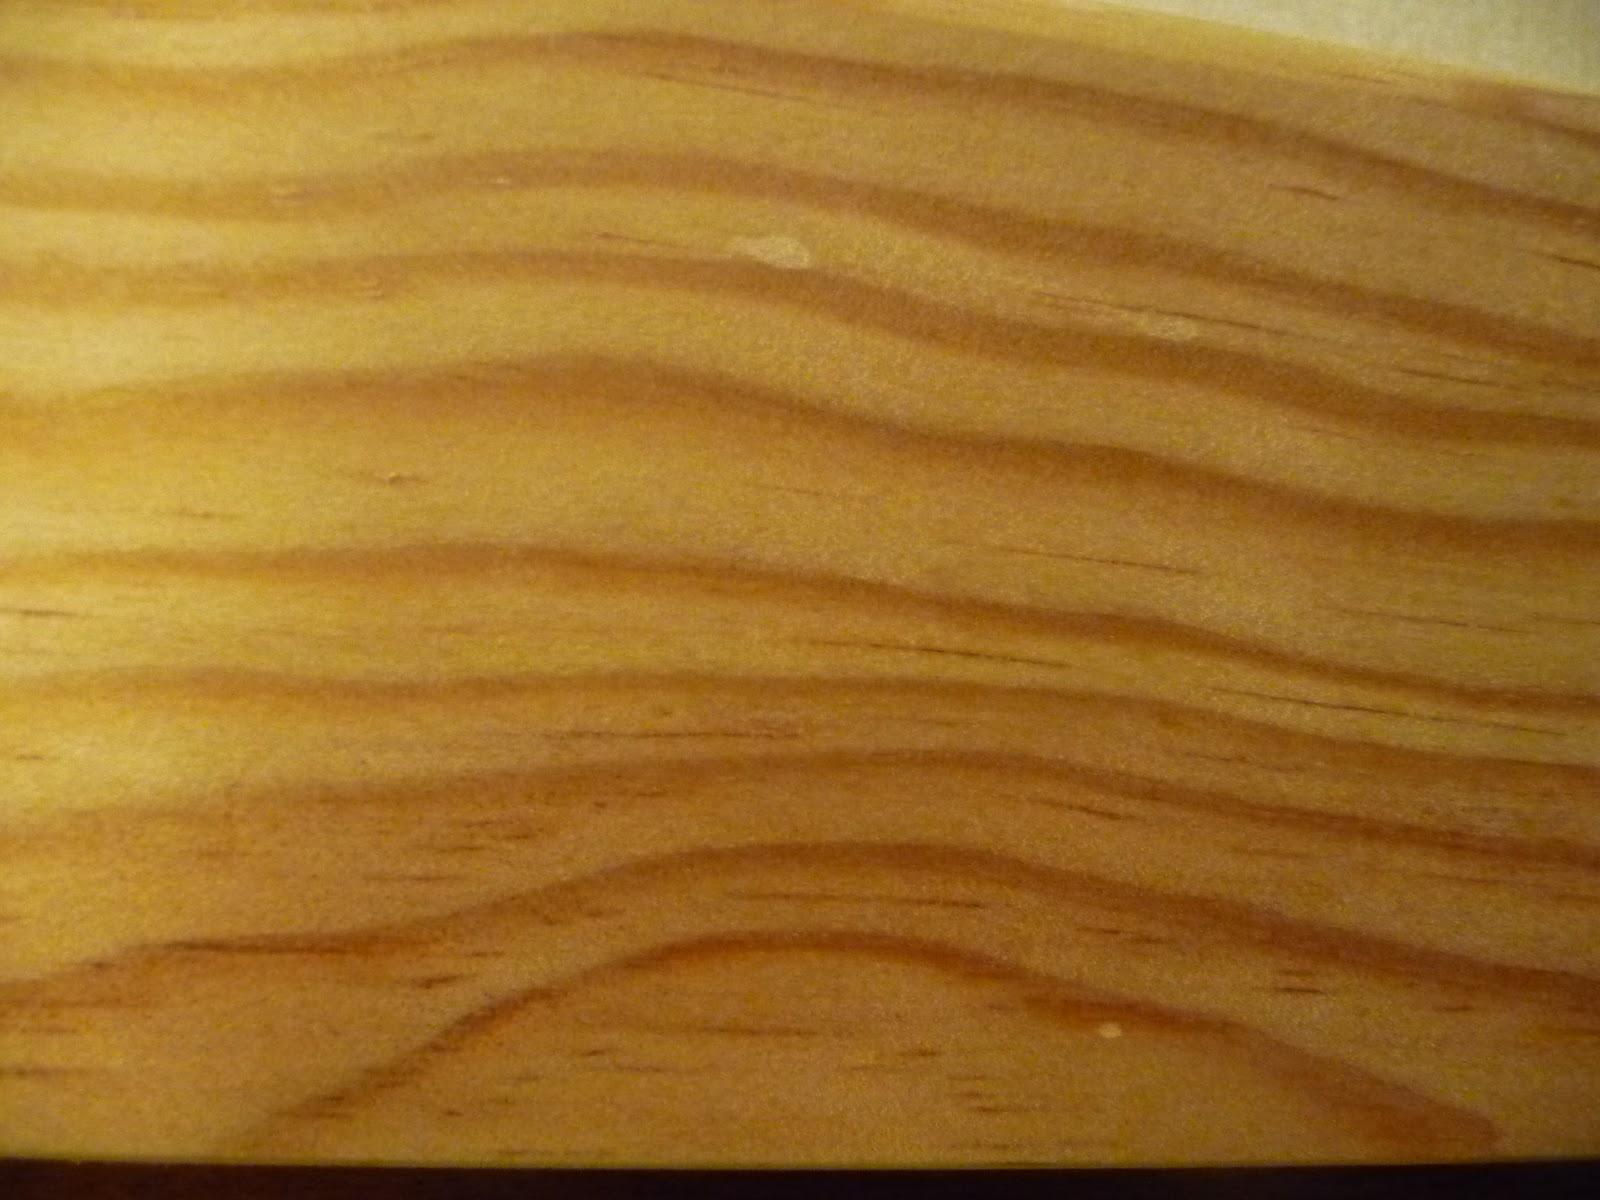 kpg models las vetas de la madera